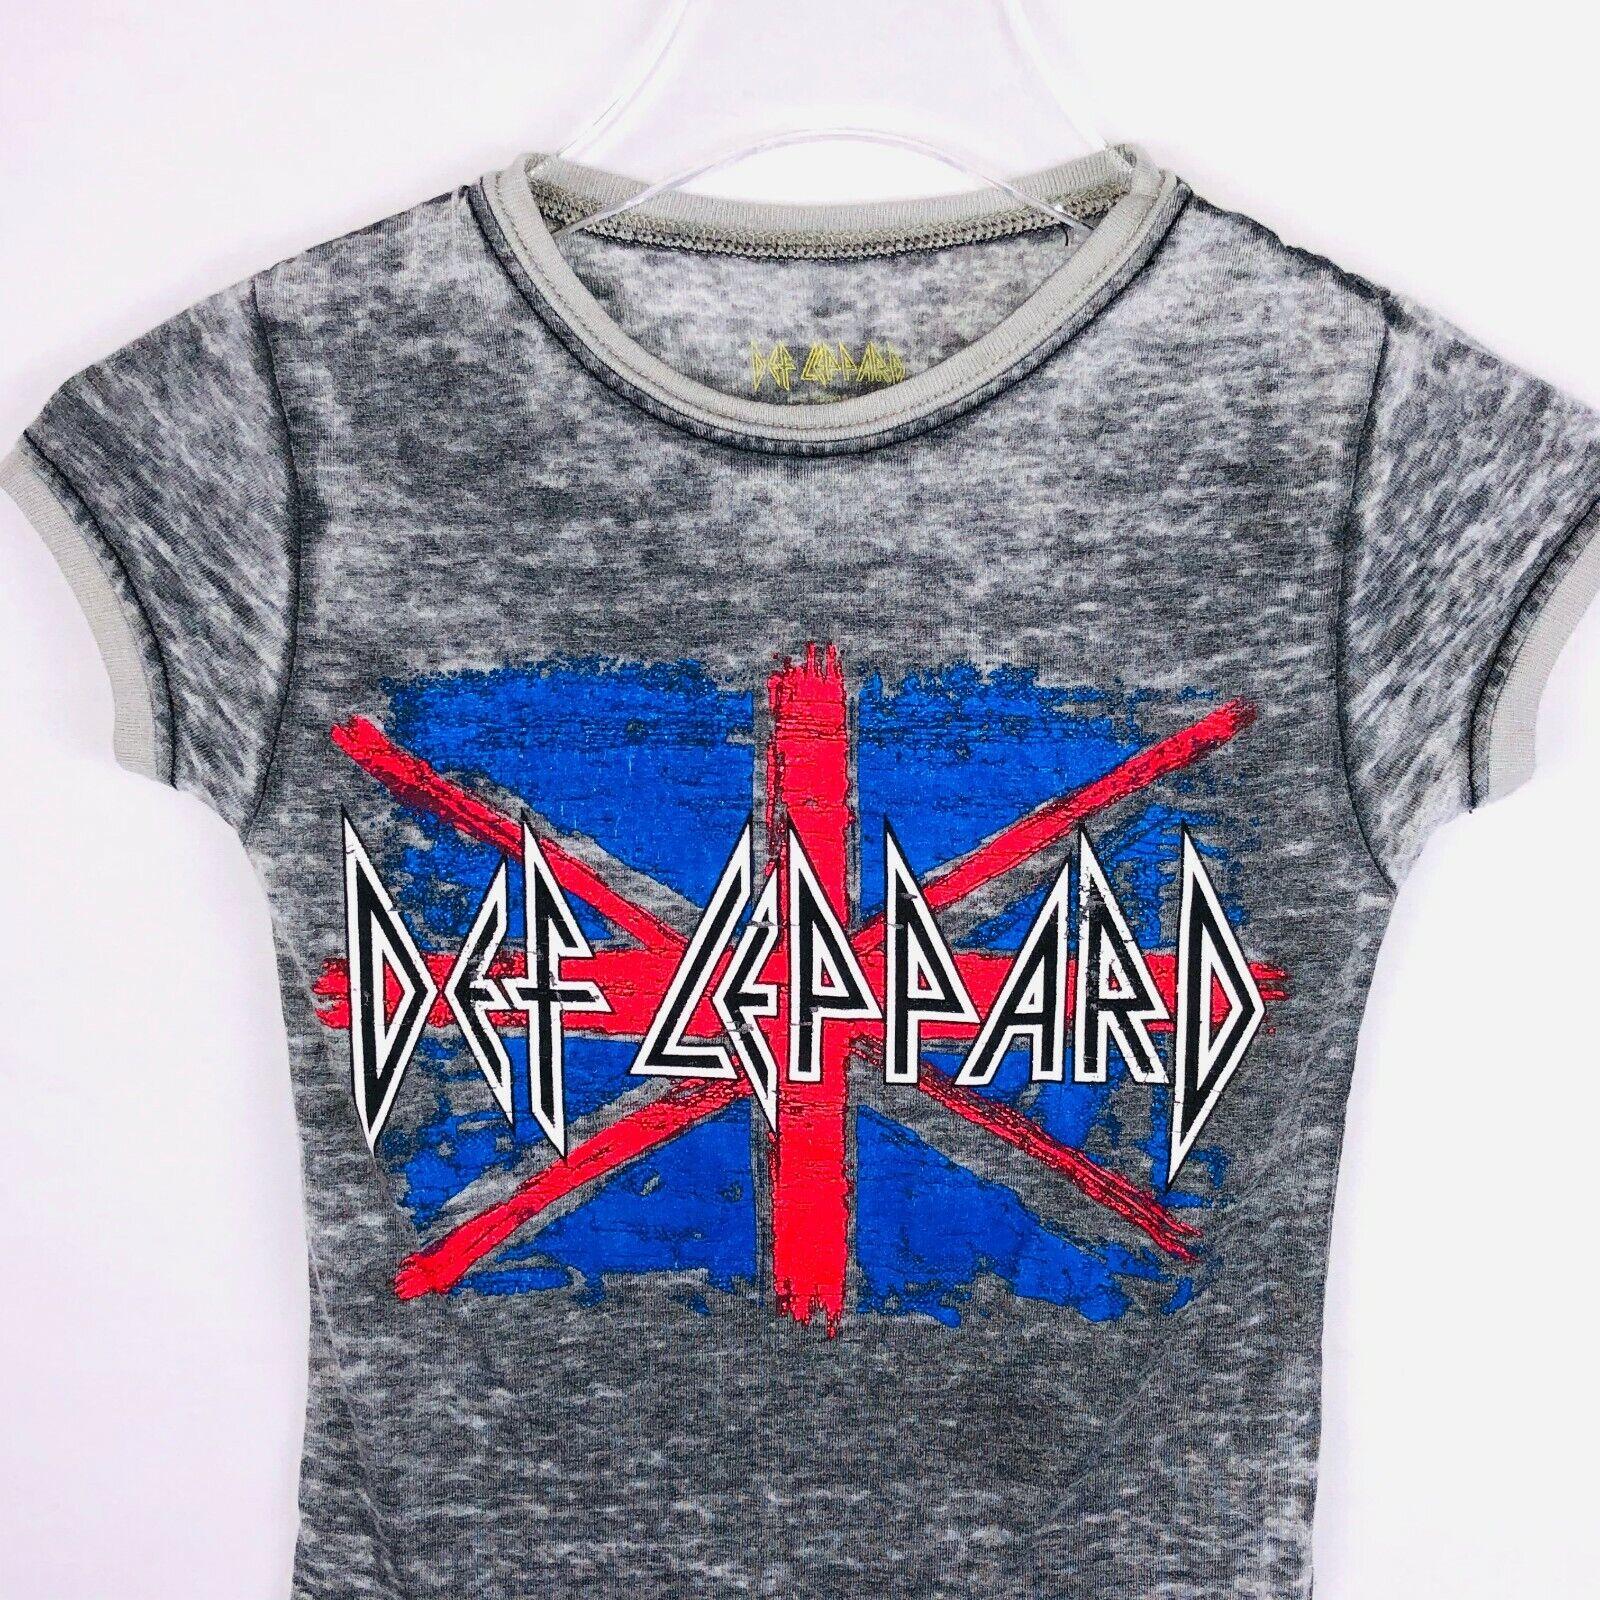 Def Leppard Burn Out Material Unisex M (7/8) T Shirt